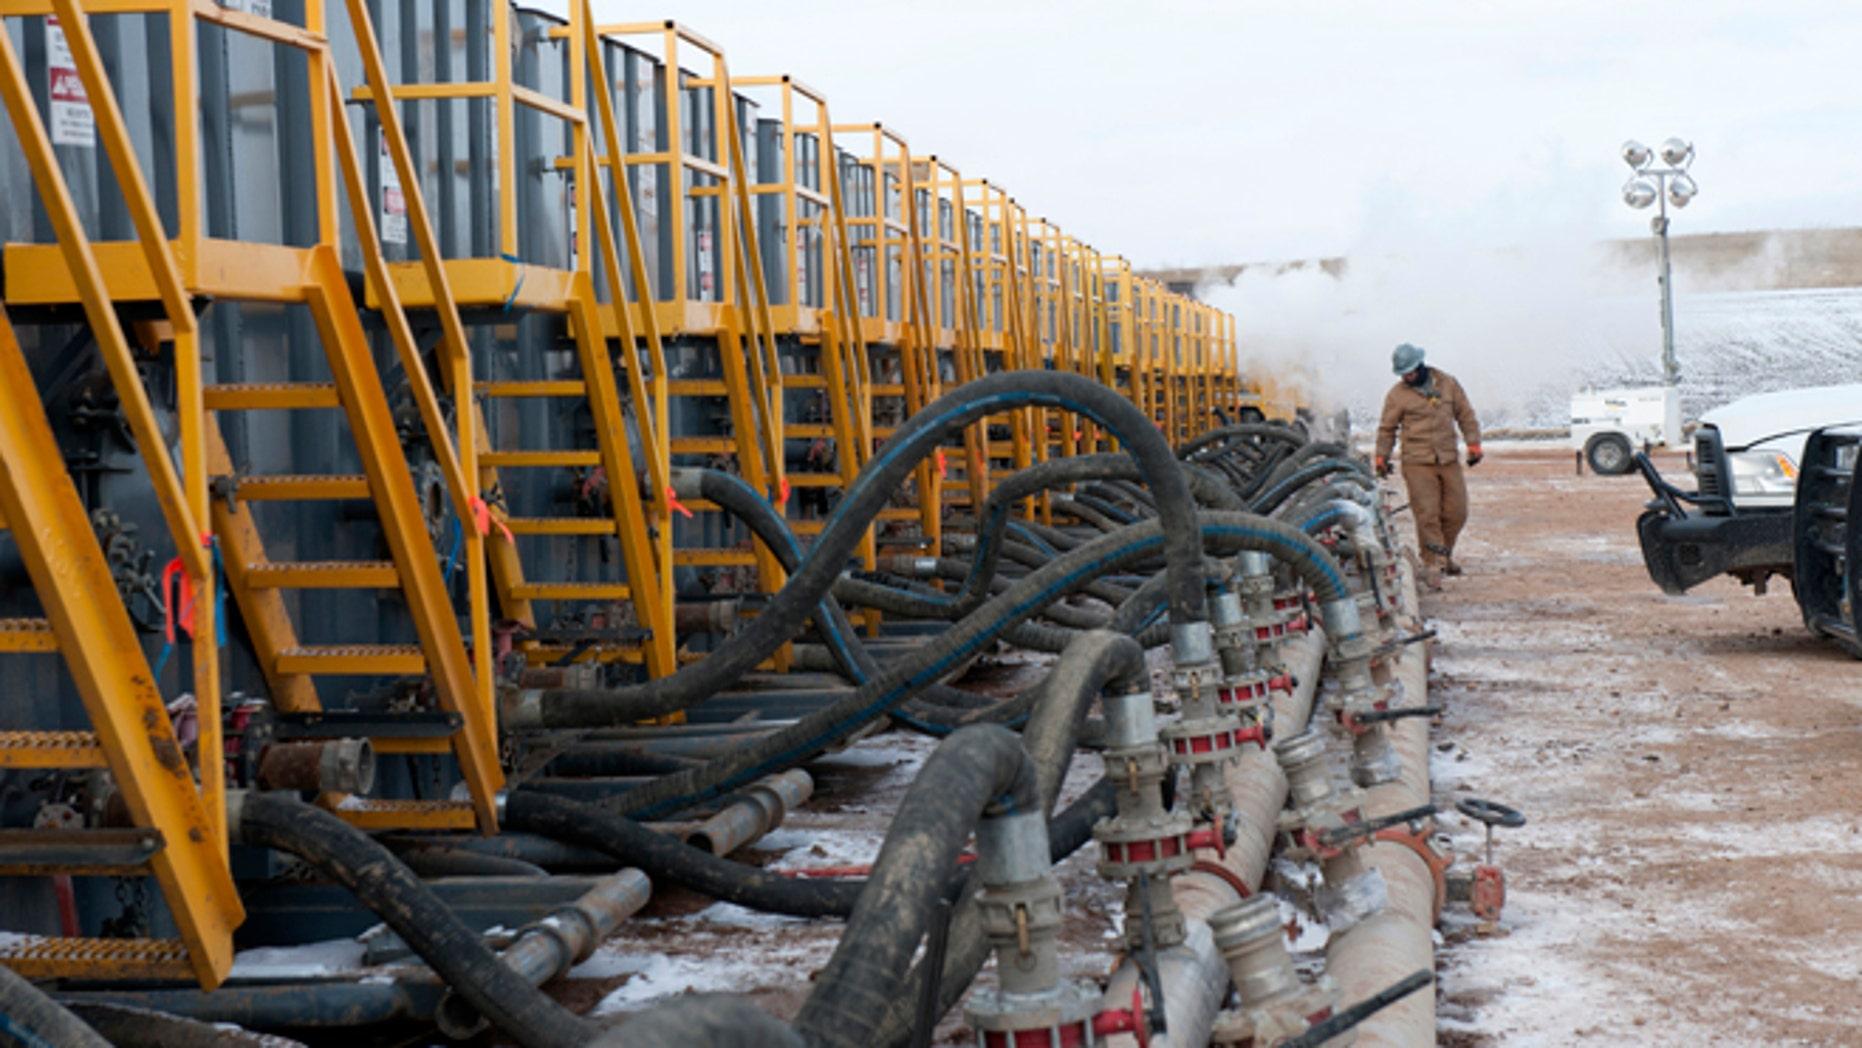 This Nov. 12, 2014 file photo shows water tanks at fracking site near Williston, North Dakota.